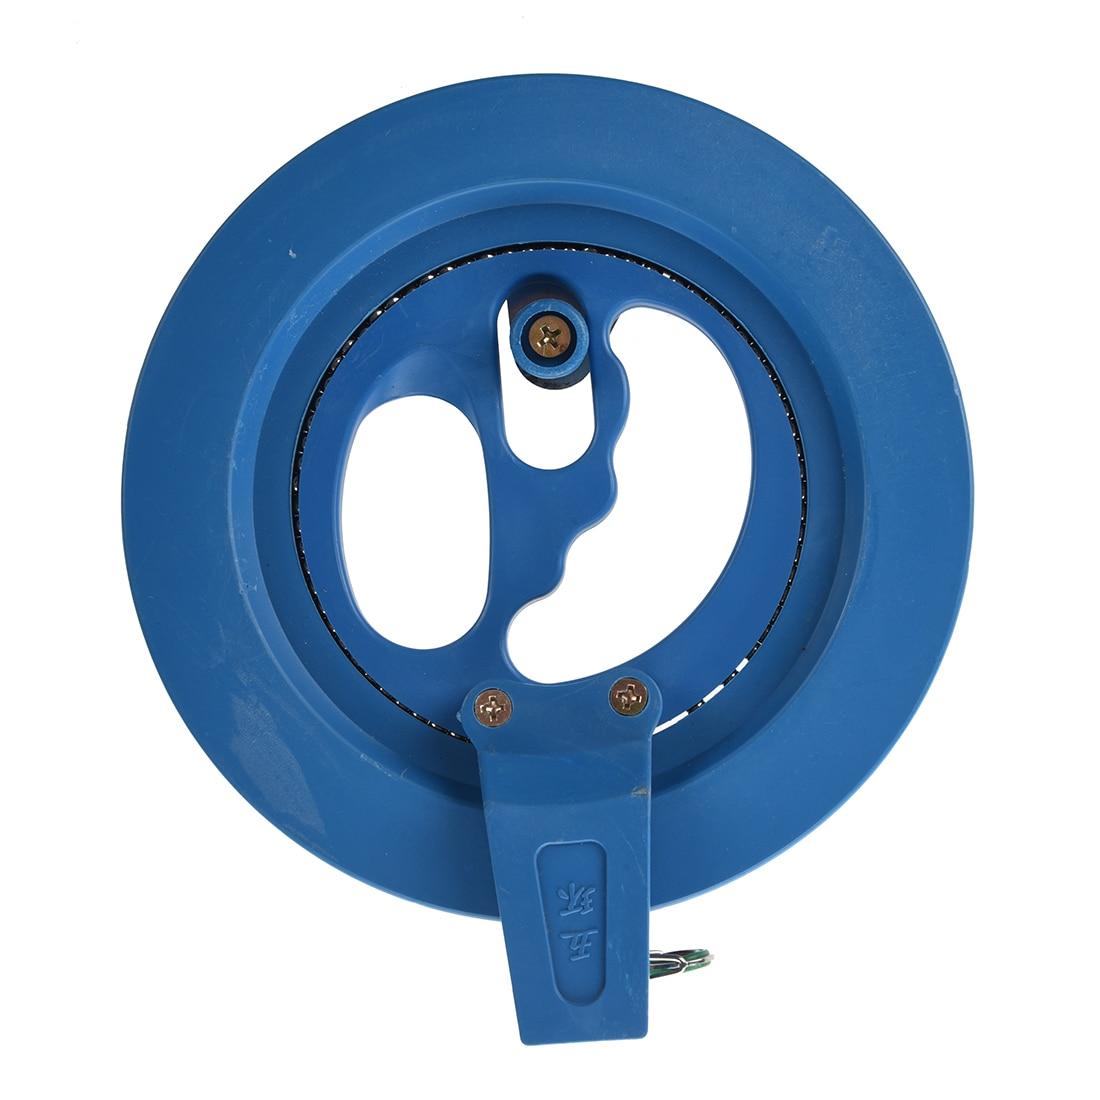 New-Blue-Outdoor-Kite-Tool-Ballbearing-Blue-Plastic-Reel-Line-Winder-1